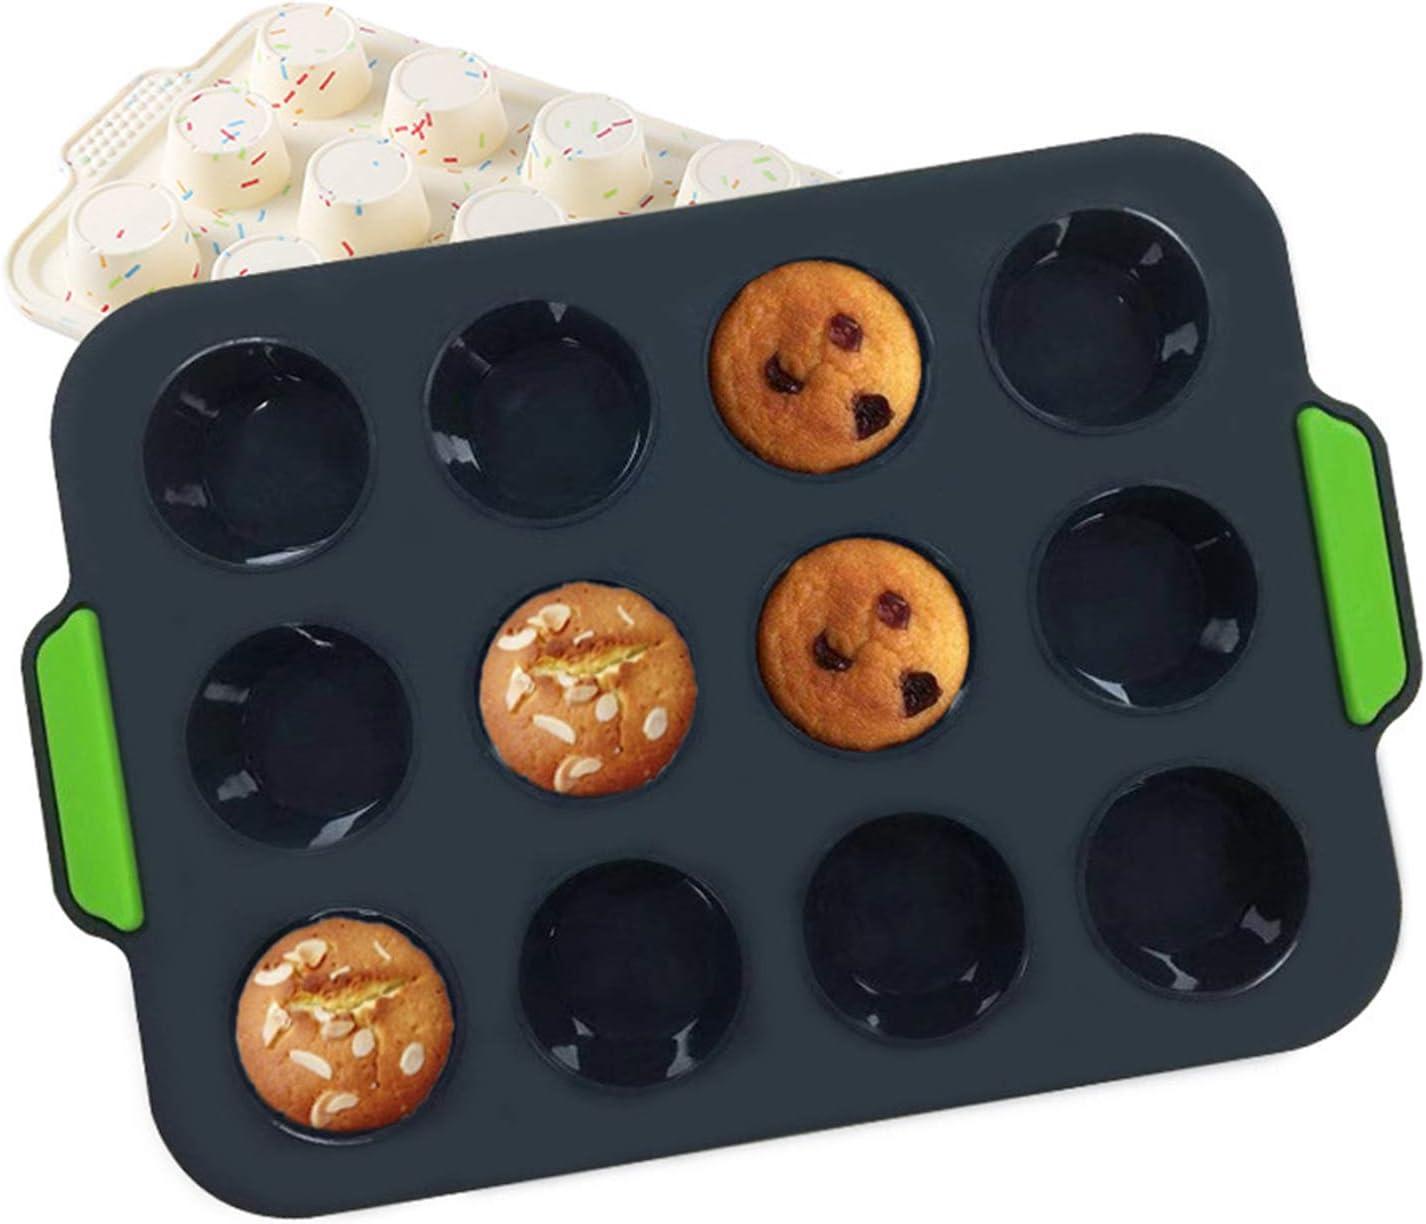 Silicone Mini Translated Muffin 5 ☆ popular Pan 12 Cup Cupcake Gra Food Non-stick